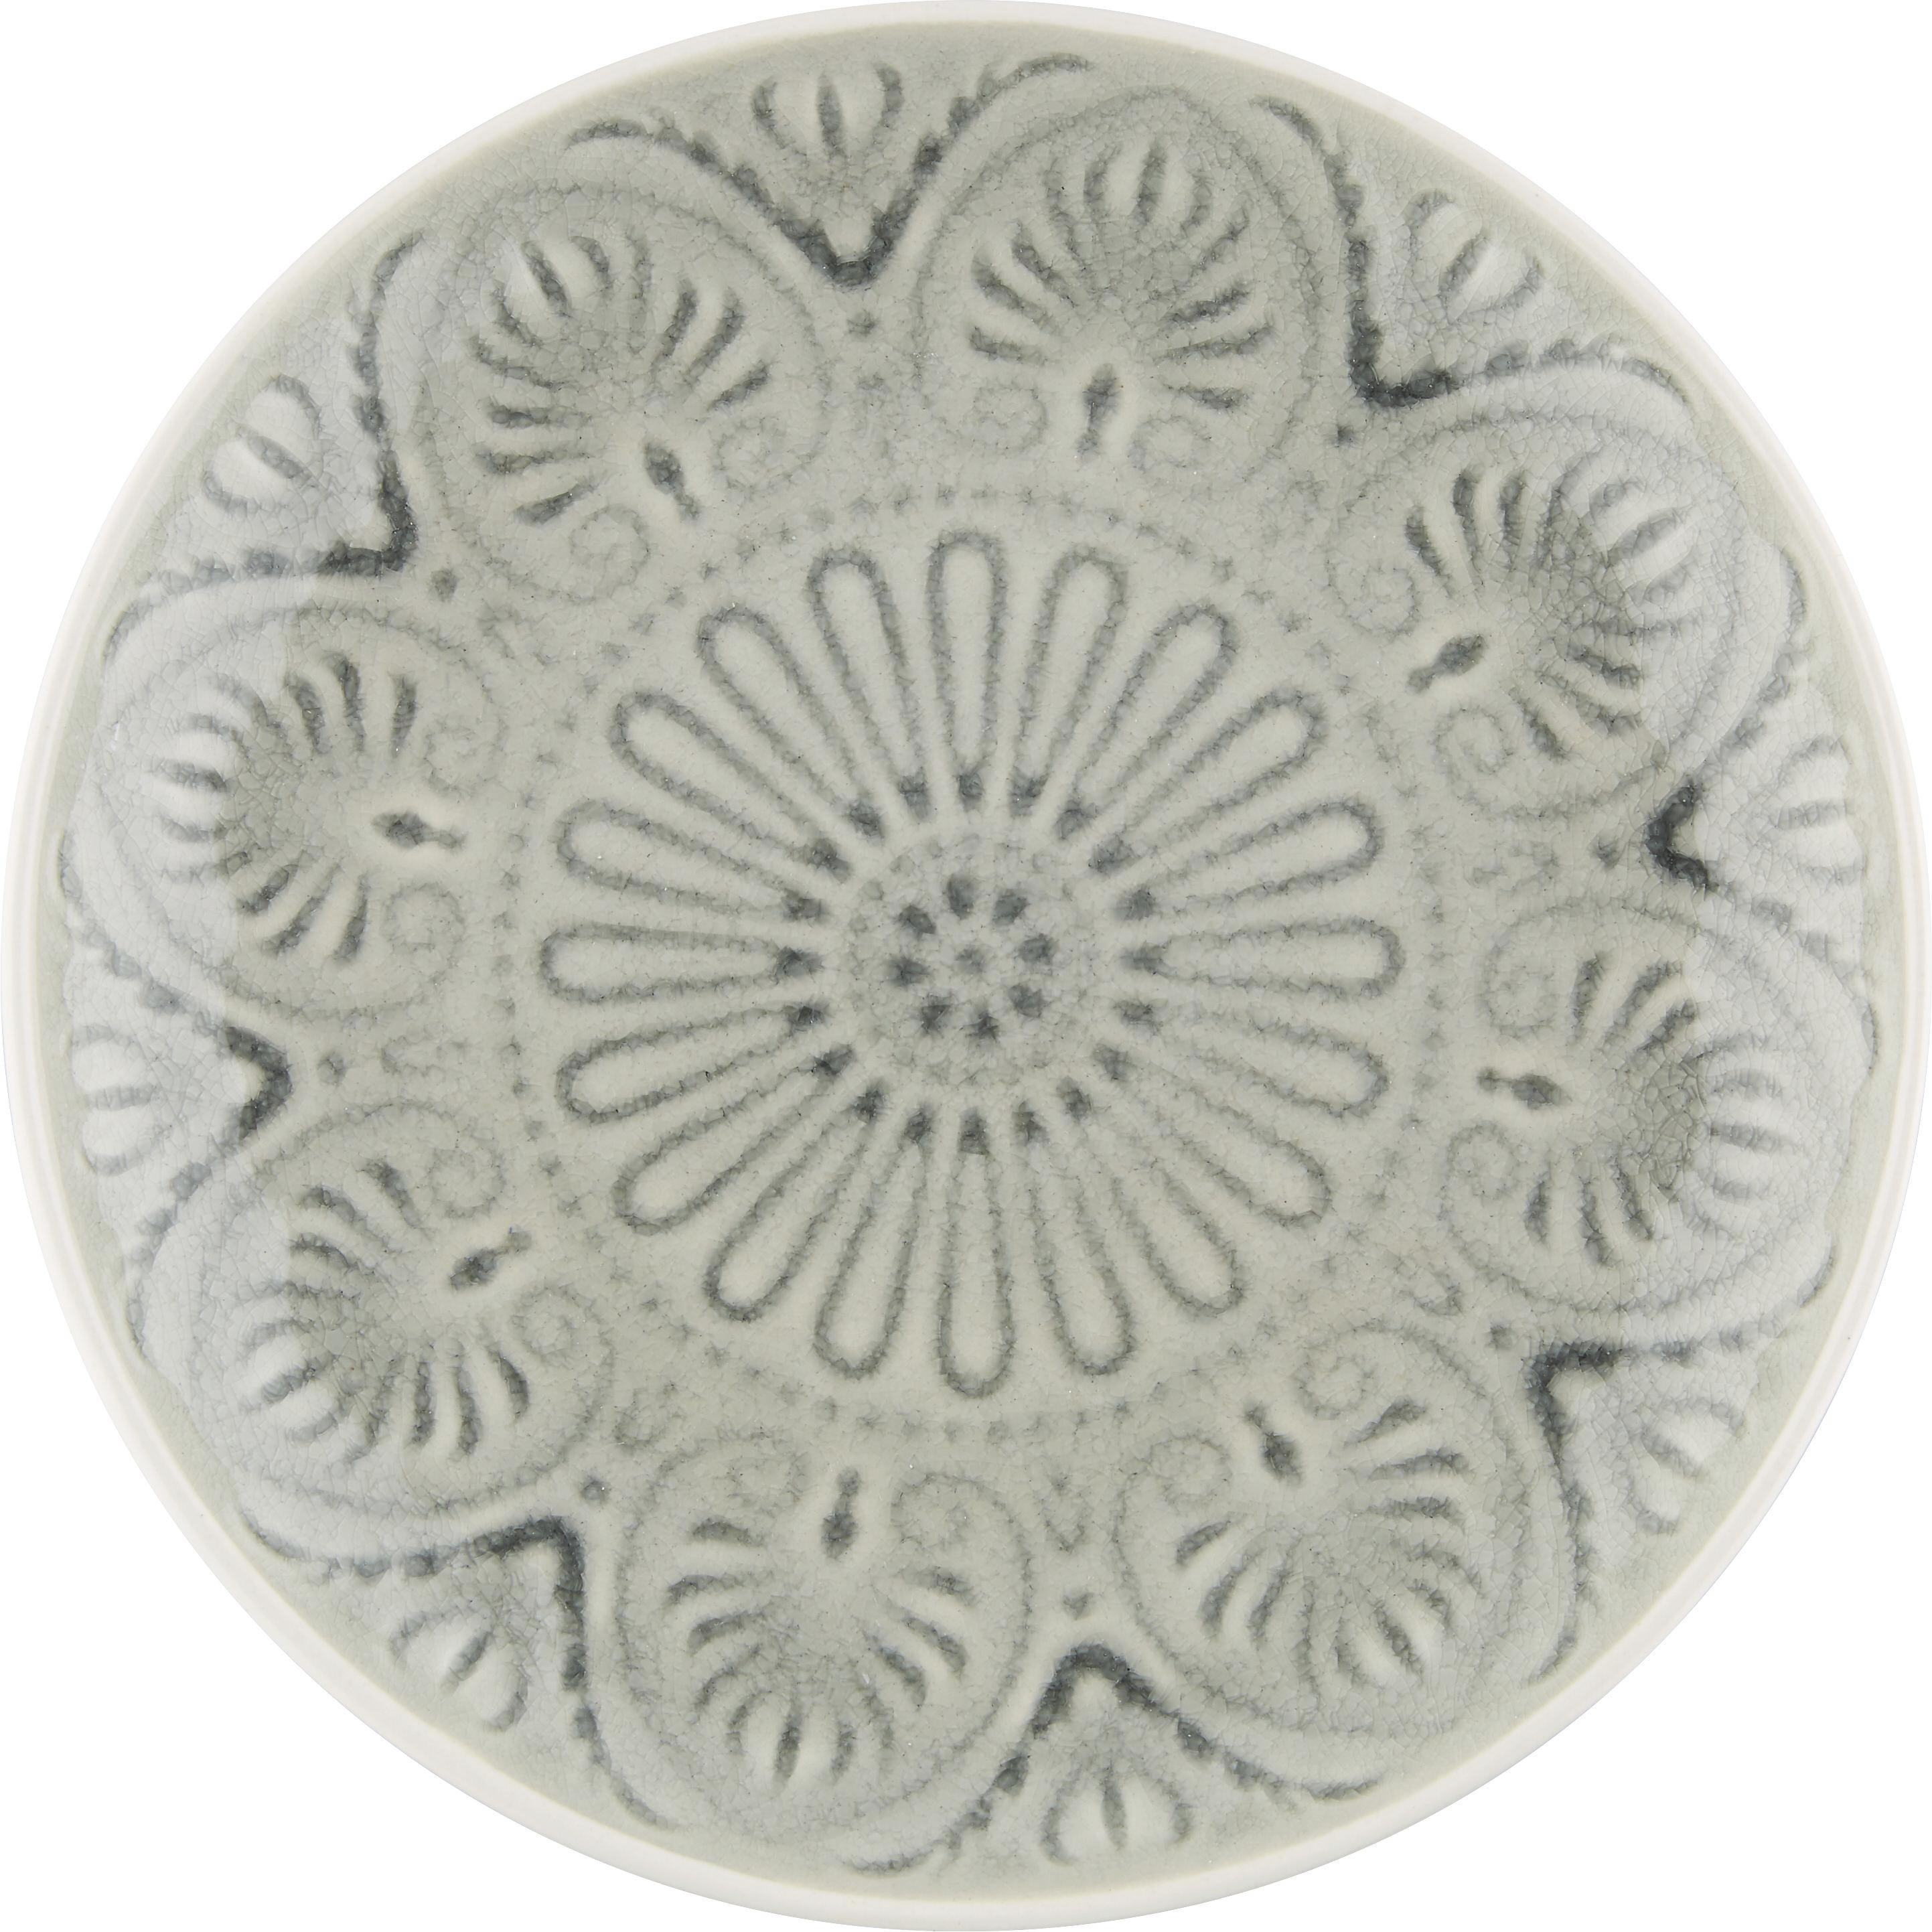 Desertni Krožnik Panja - siva, Trendi, keramika (20/3,2cm) - MÖMAX modern living